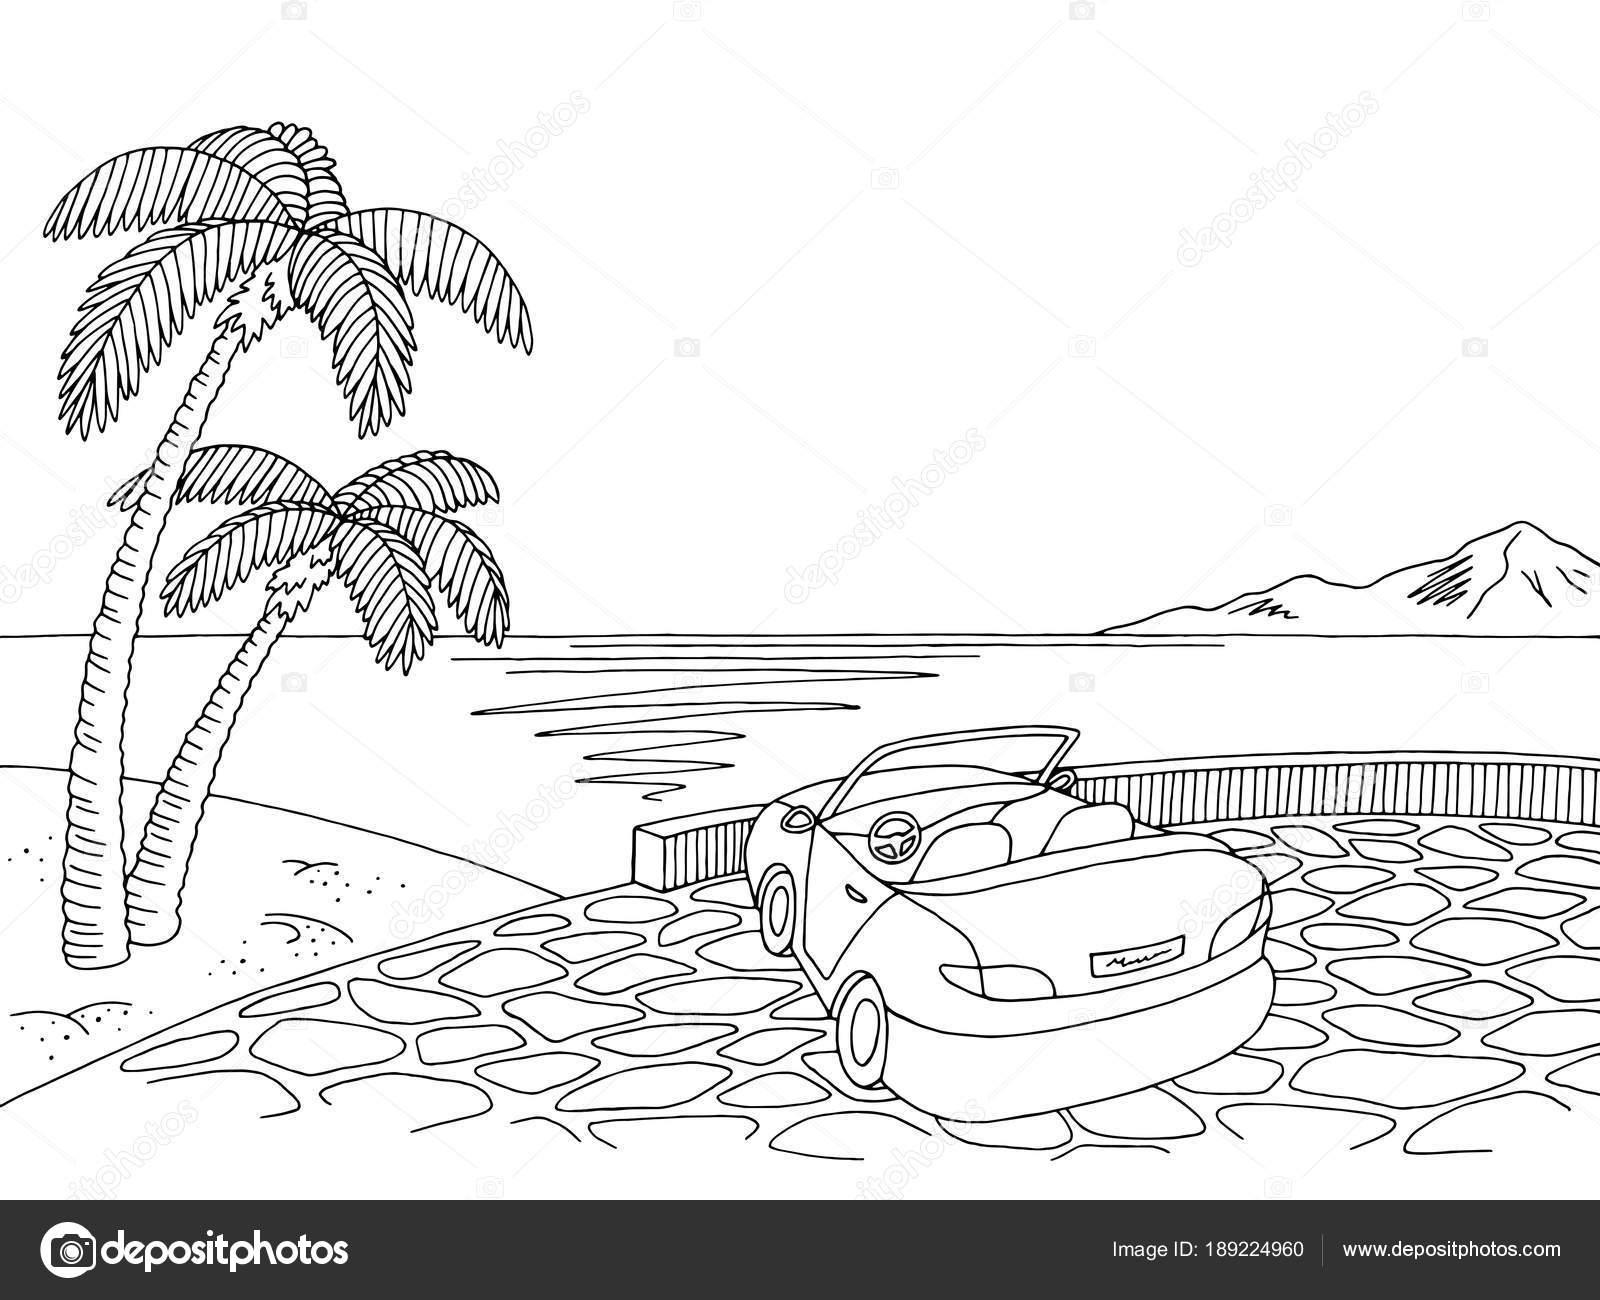 Fotos Paisajes Marinos Para Pintar Mar Costa Cabriolet